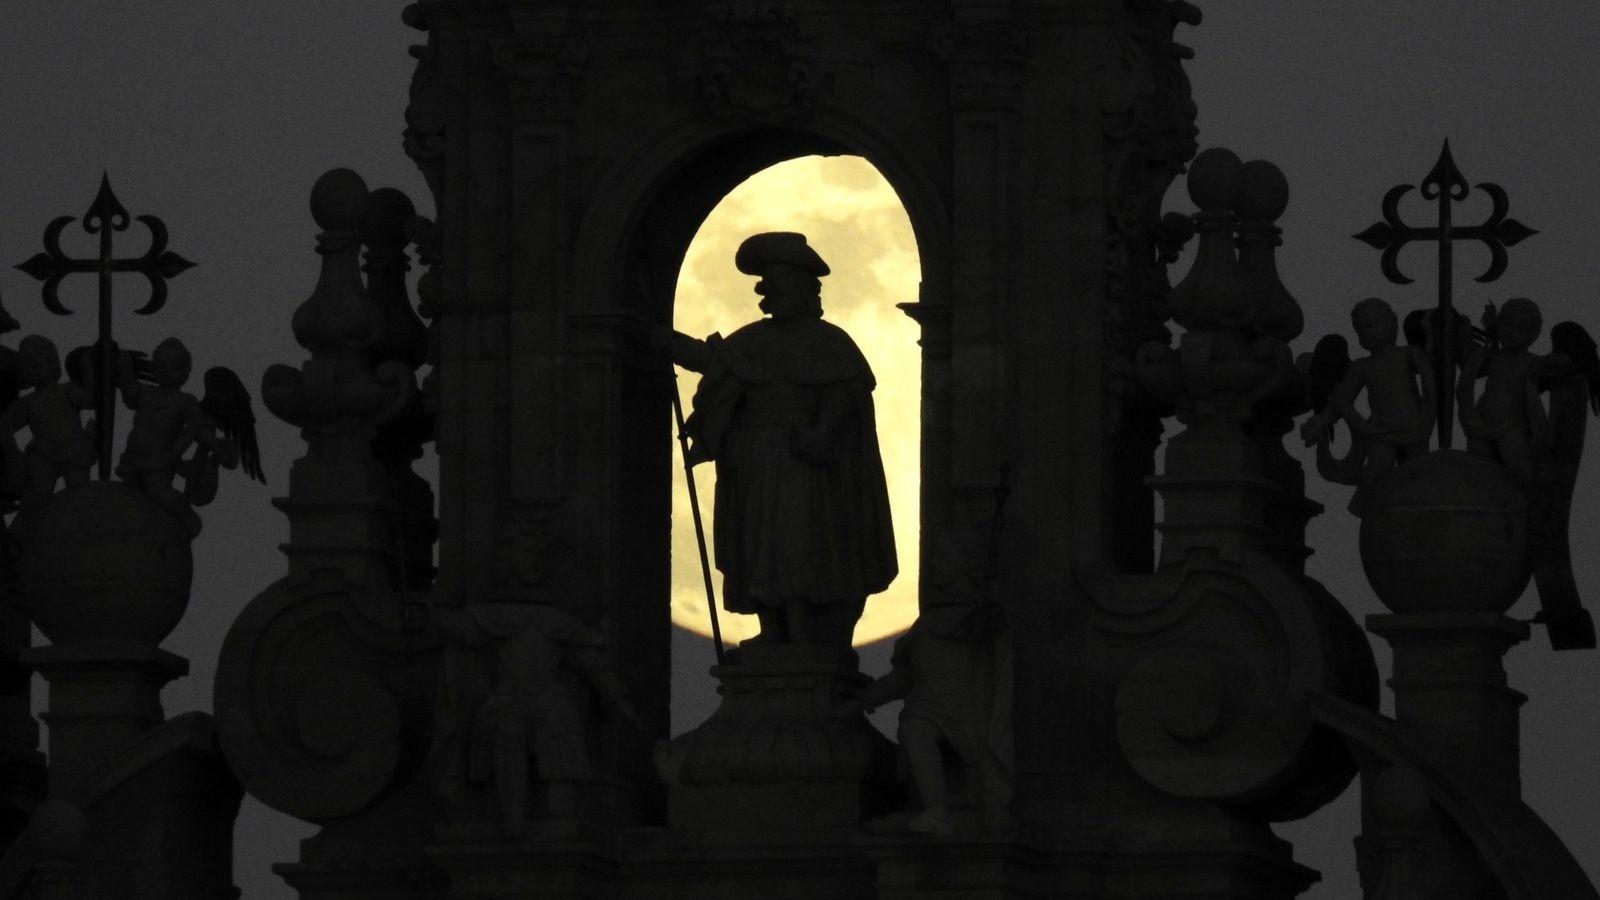 Foto: La luna llena asciende sobre la figura del Apóstol Santiago en la Catedral, en Santiago de Compostela. (Efe)